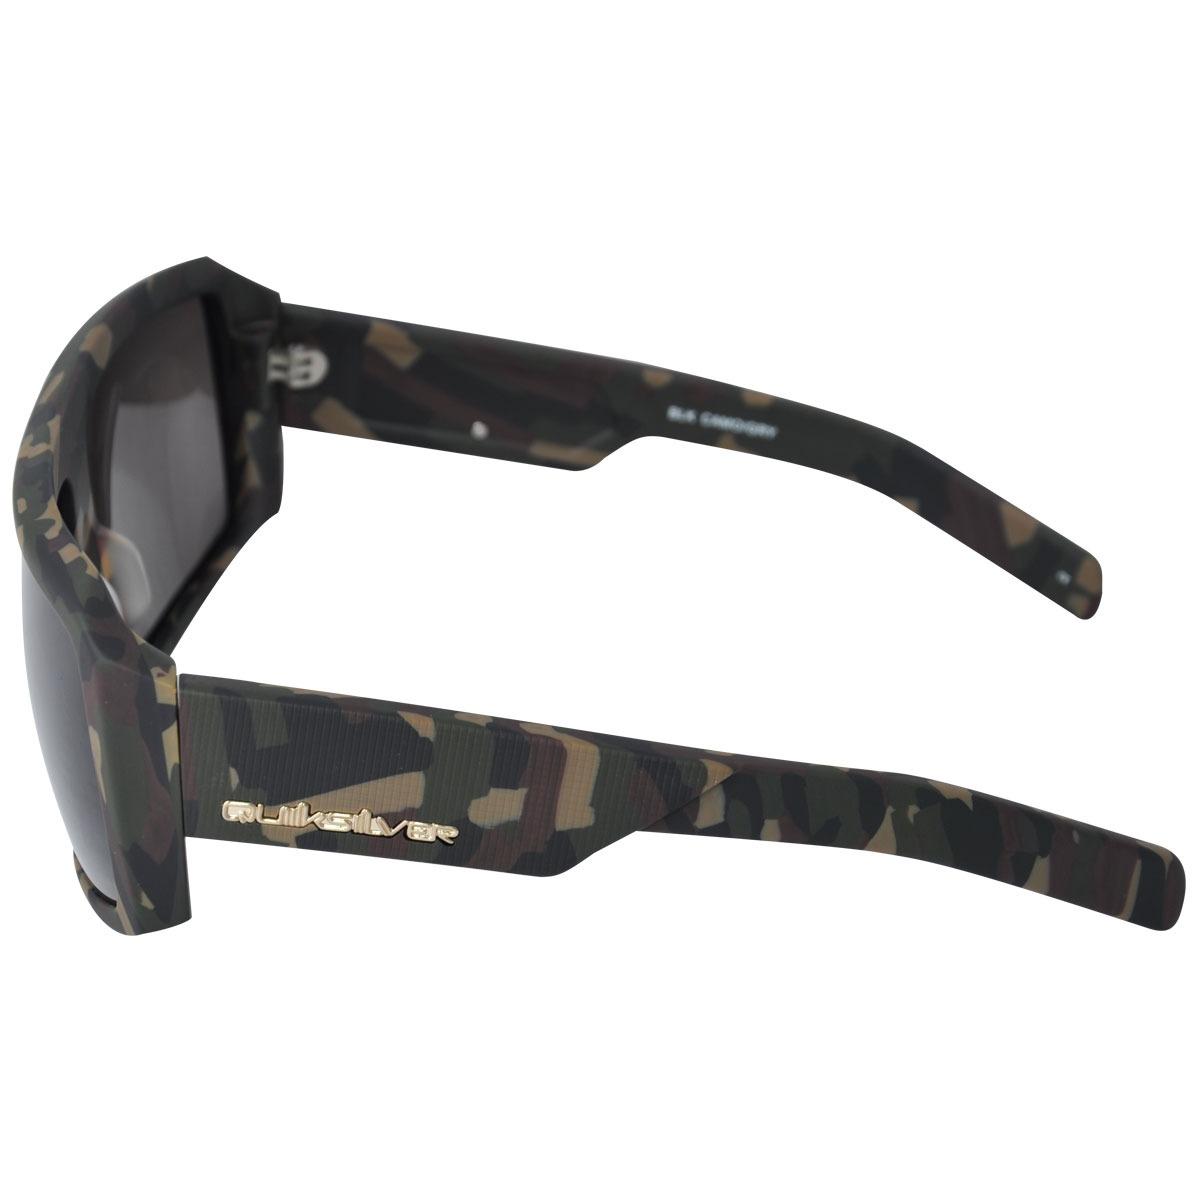 234de02f33b60 Óculos Quiksilver The Empire Camuflado - Cut Wave - R  119,90 em ...